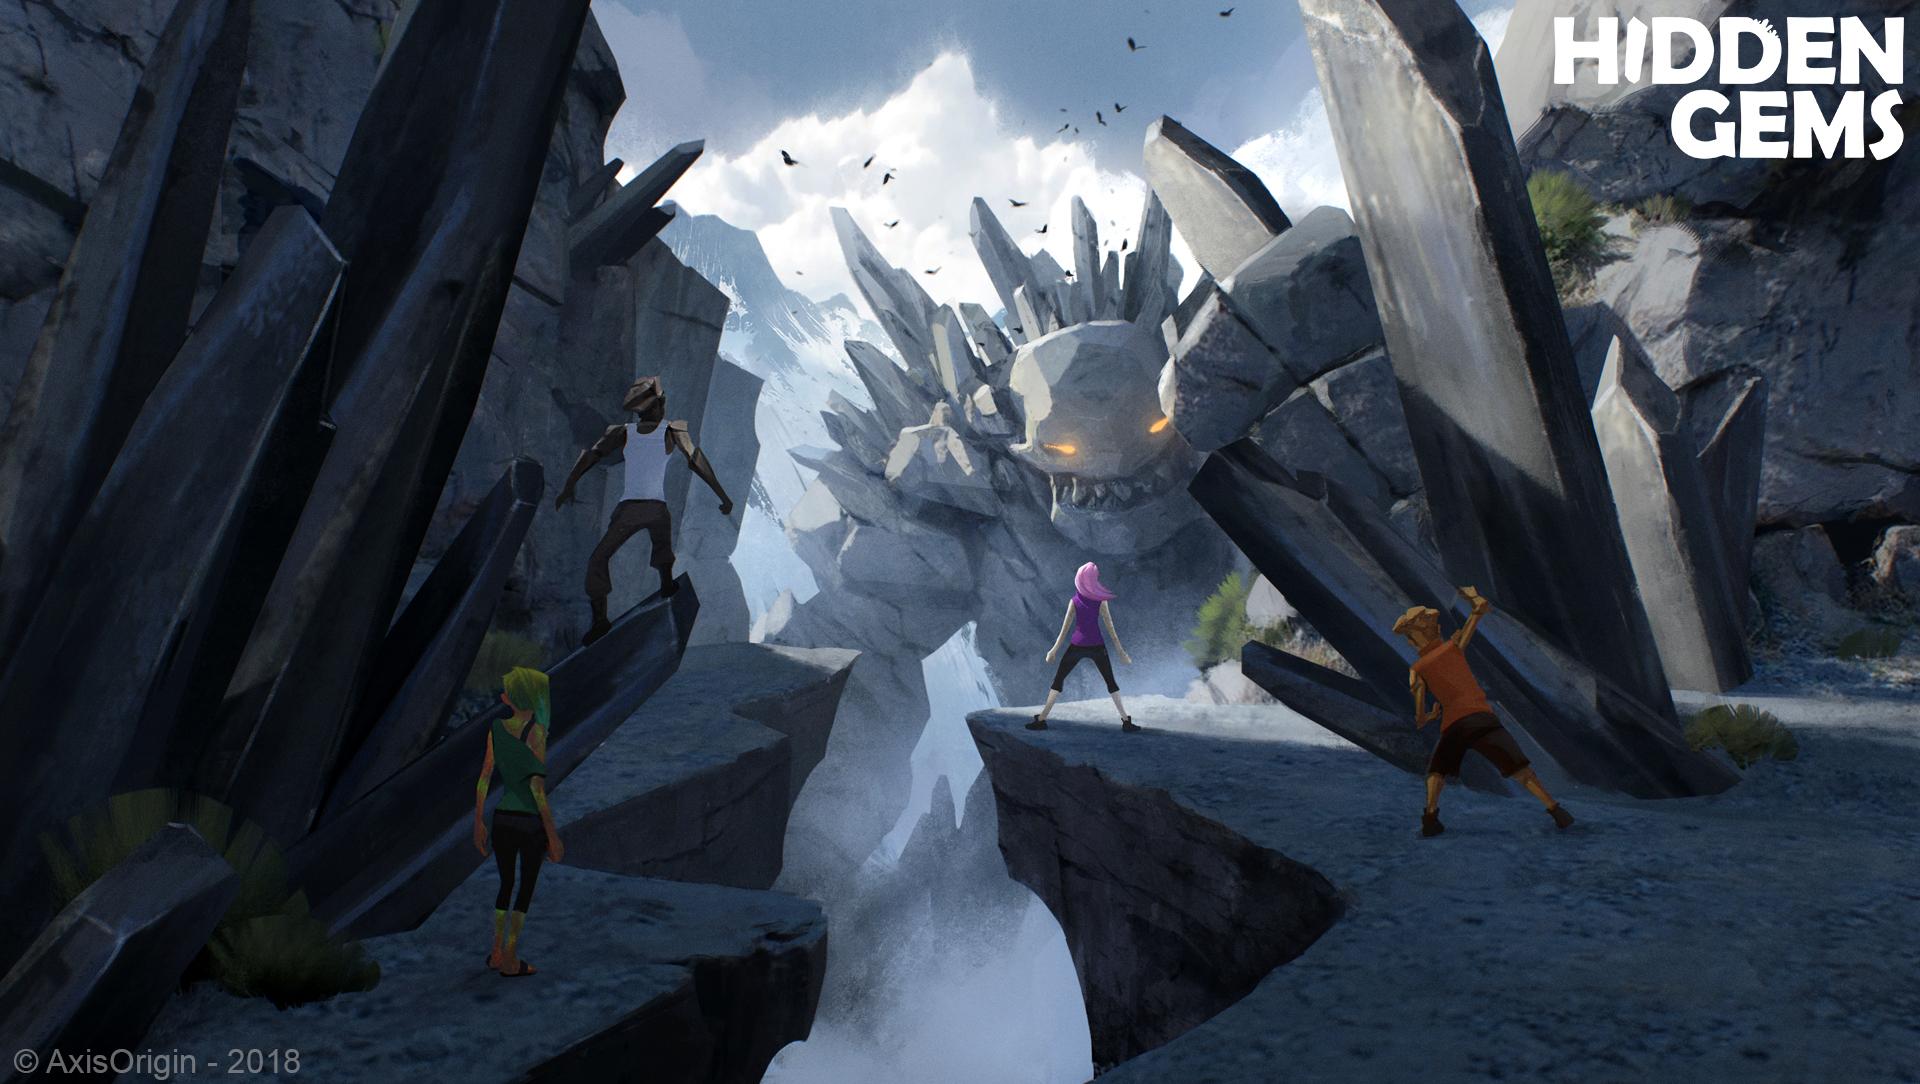 Stibnite Giant Concept Art by Nikolay Razuev